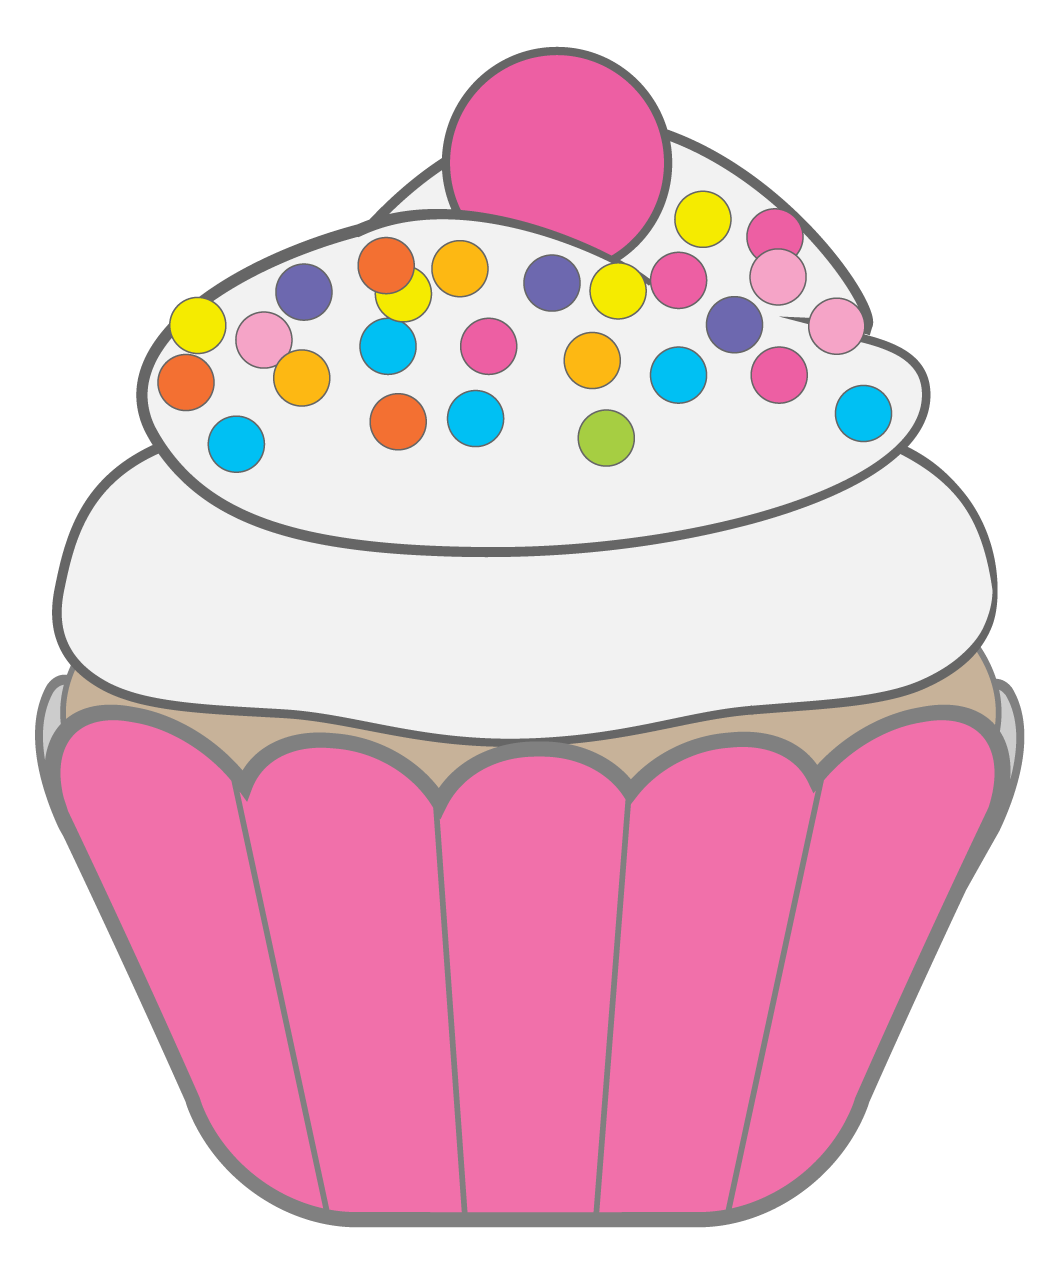 Cupcake Clip Art-Cupcake Clip Art-2